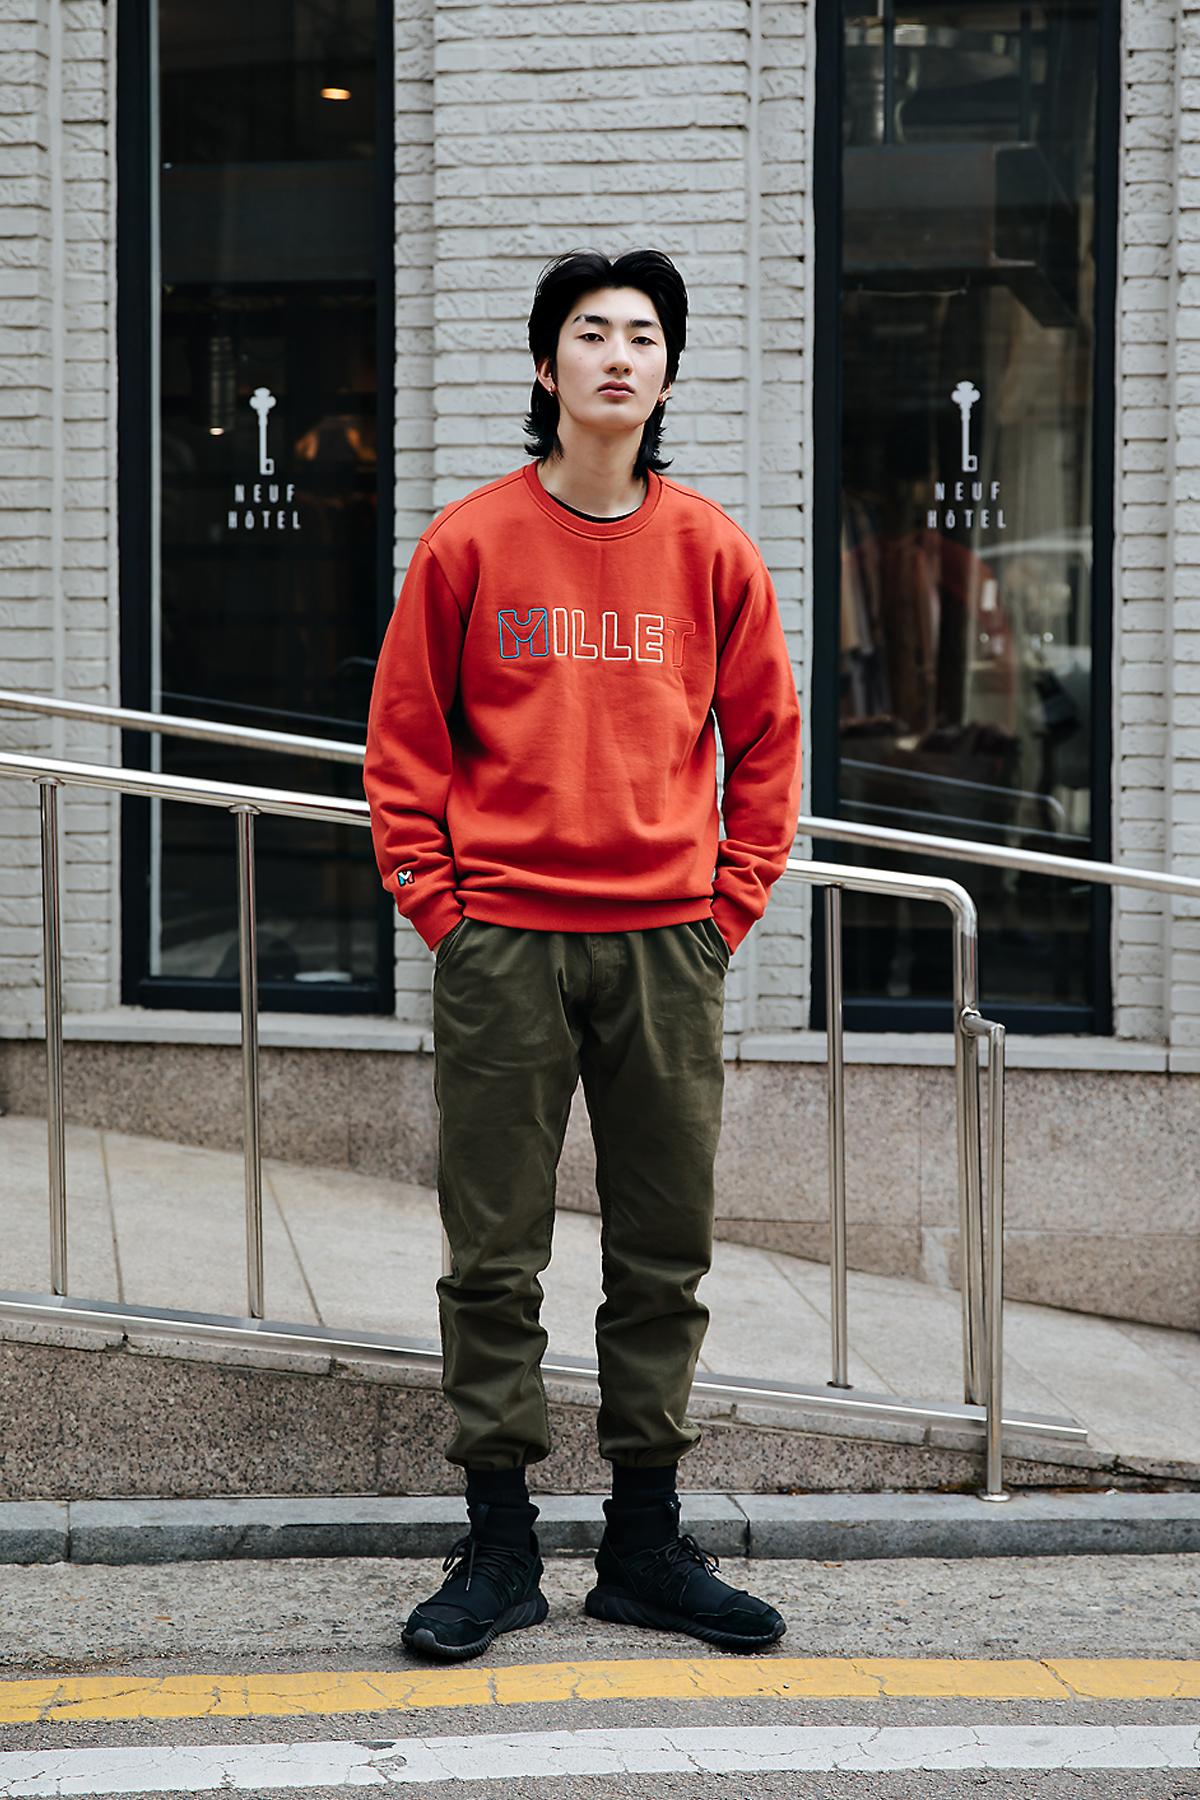 Street Fashion - 6